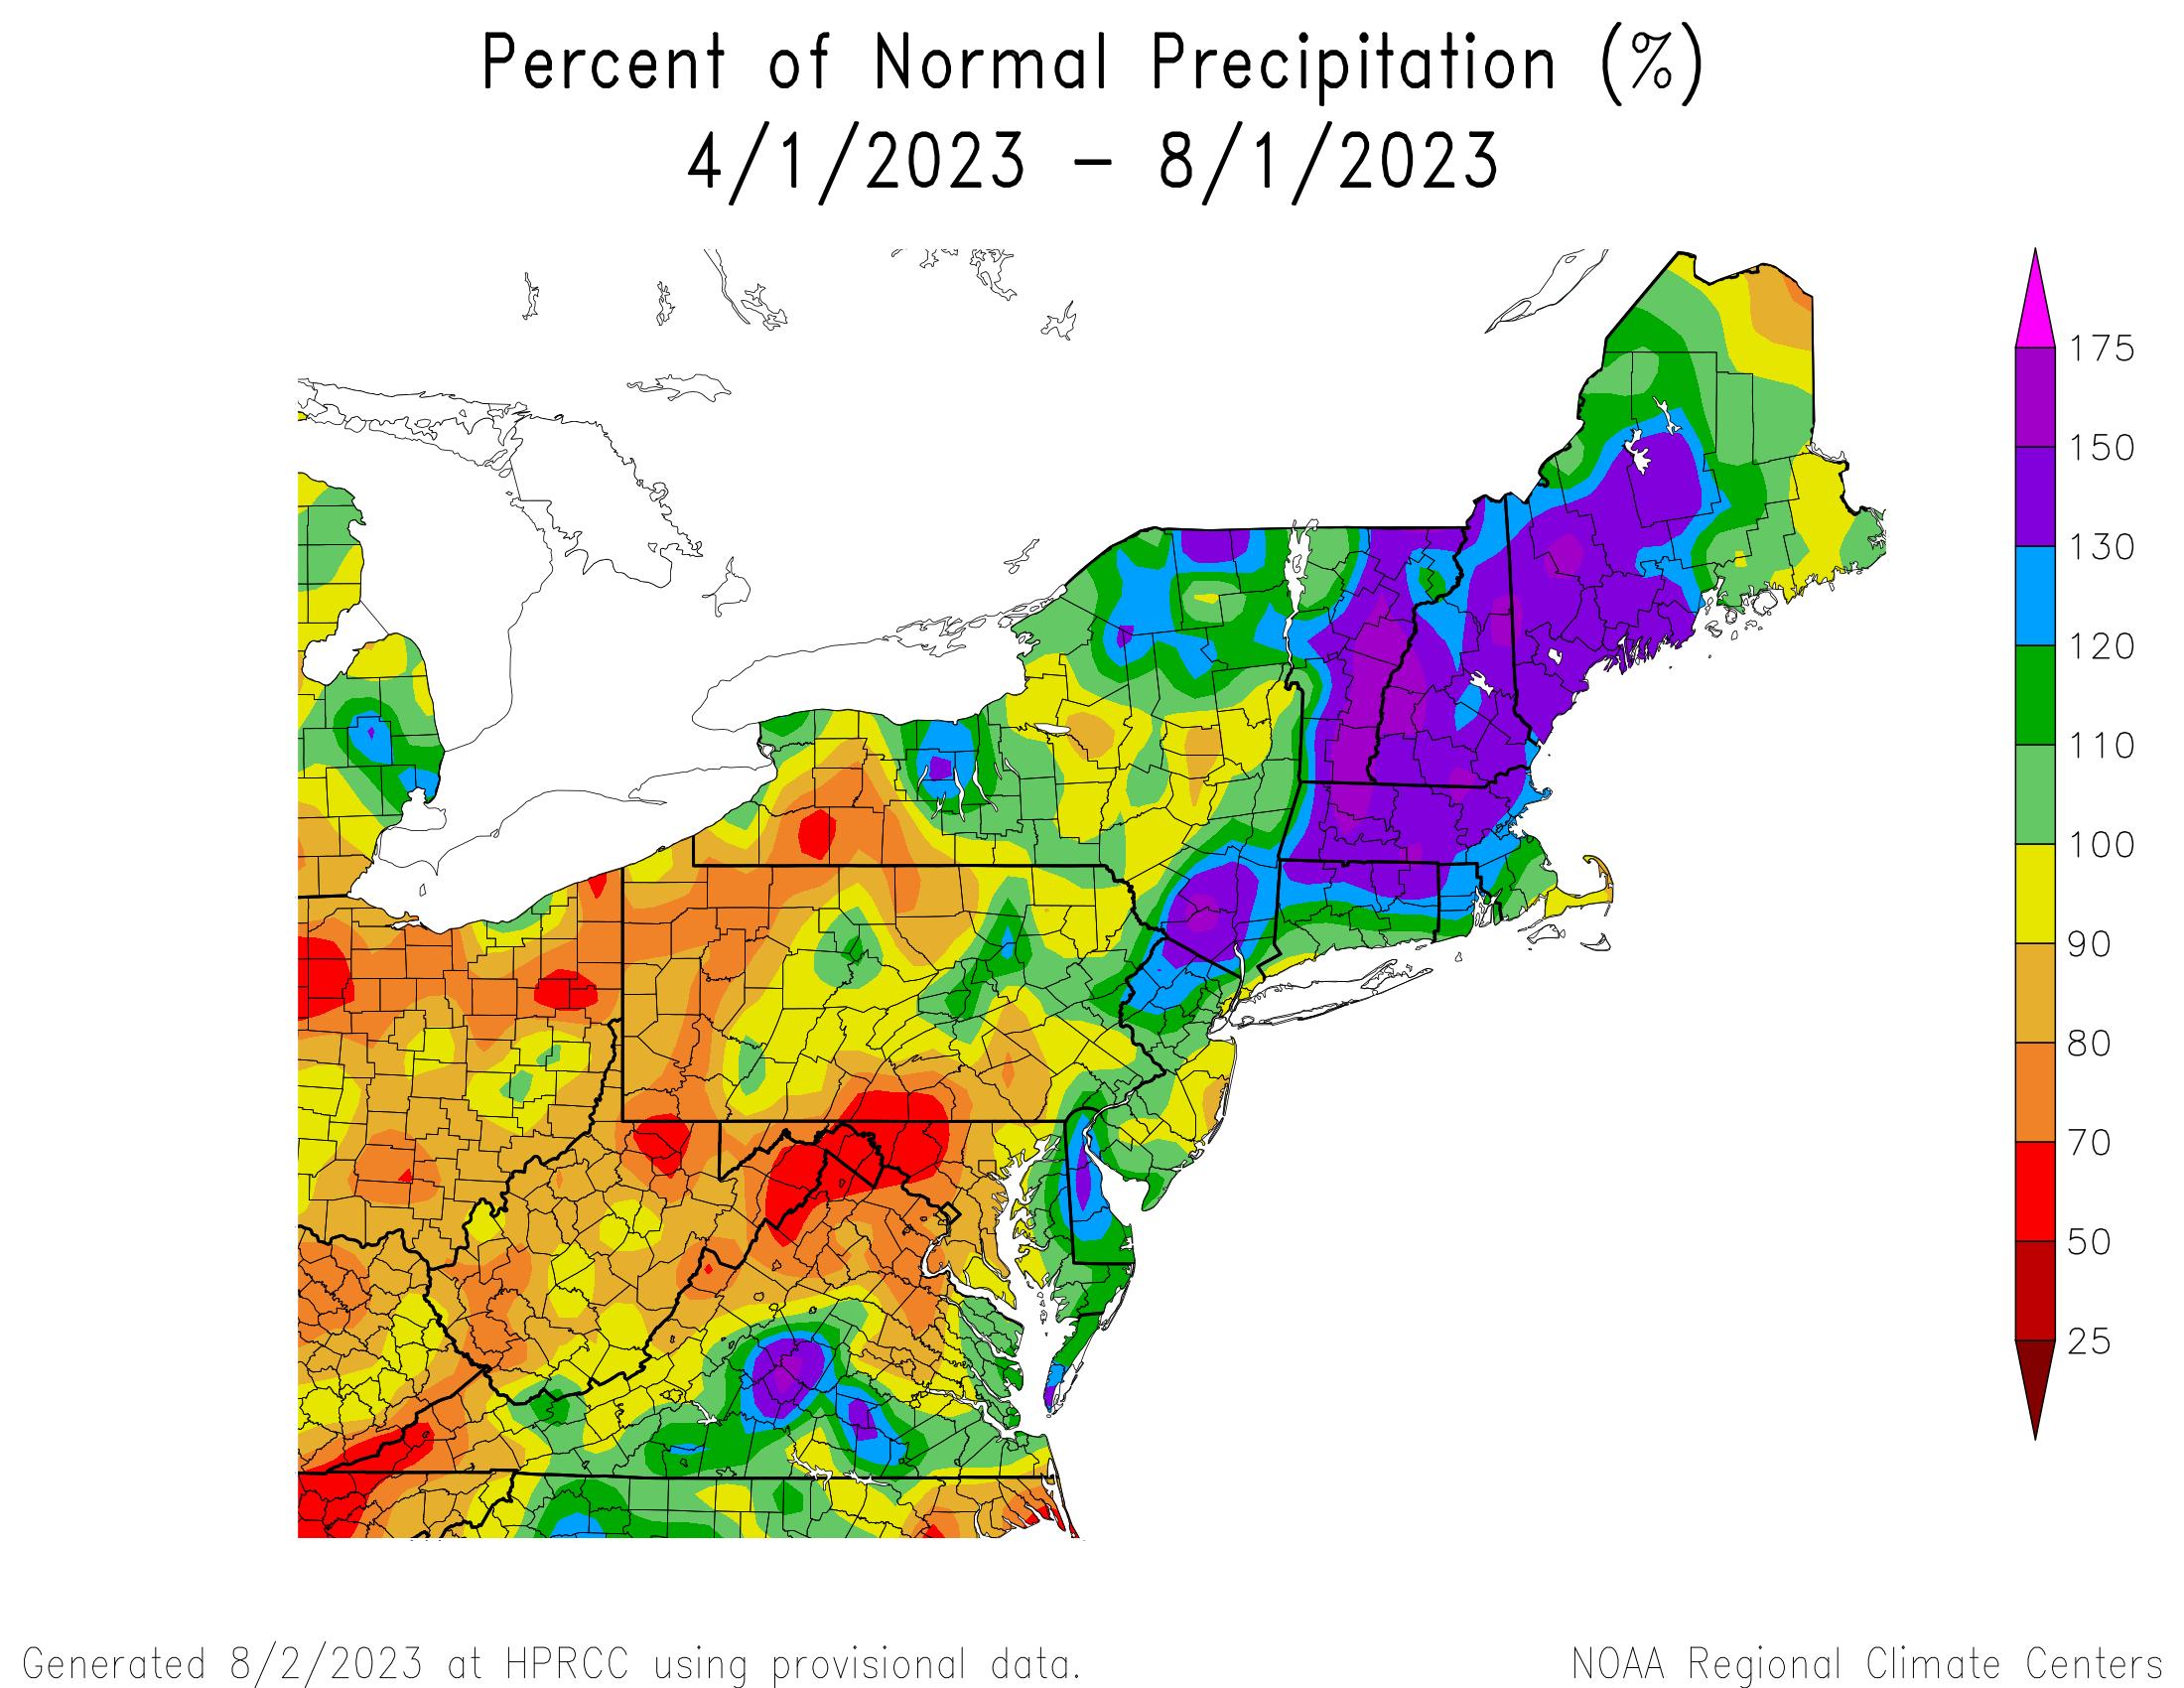 Total Precipitation Since April 1st - Percentage of Normal